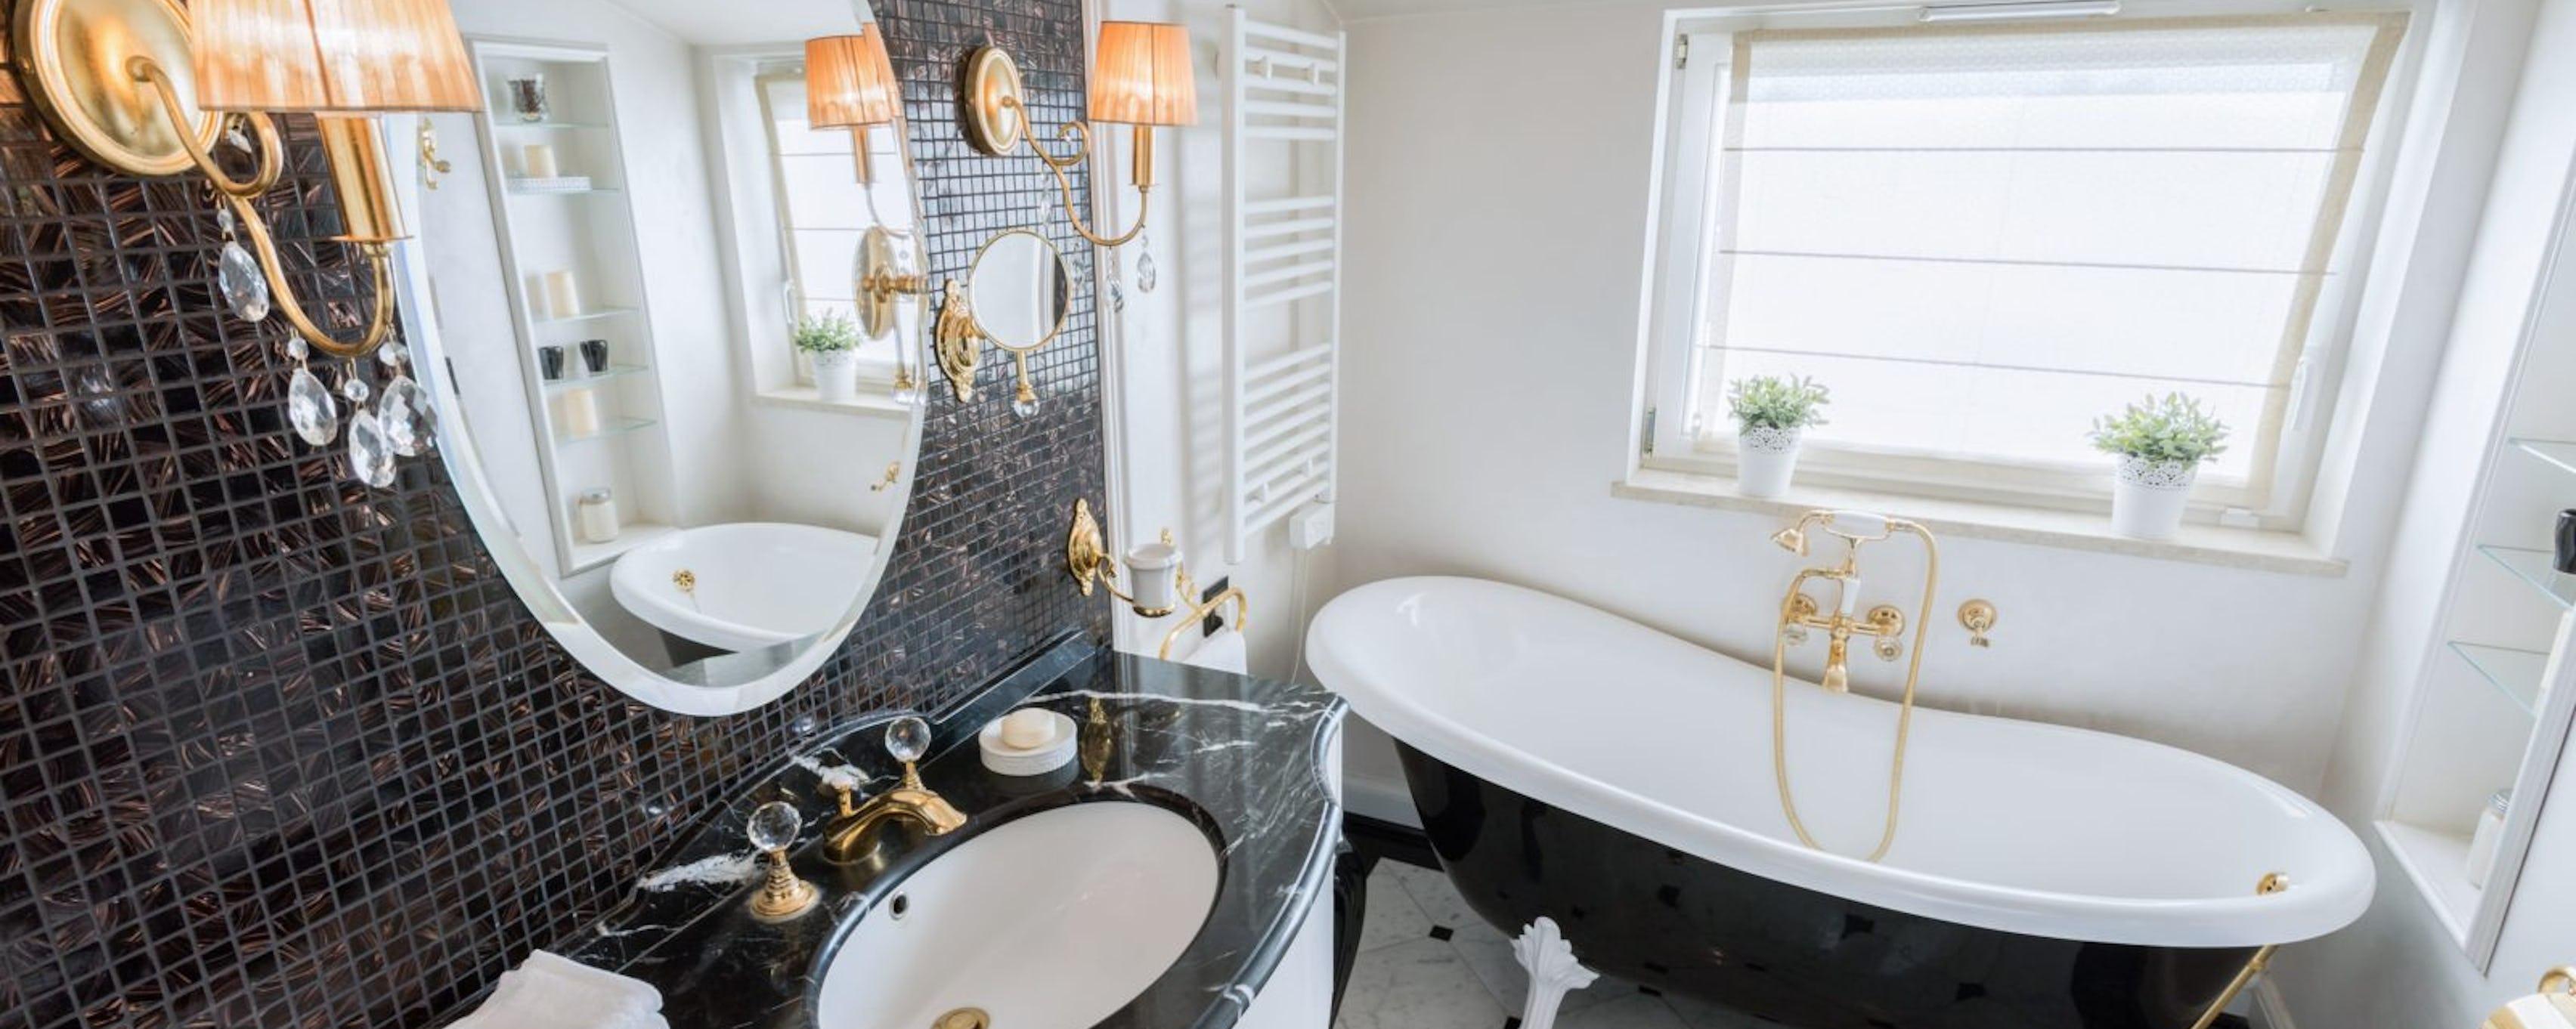 Tout Pour La Salle De Bain salle de bain de luxe, moderne et design : nos 15 meilleures